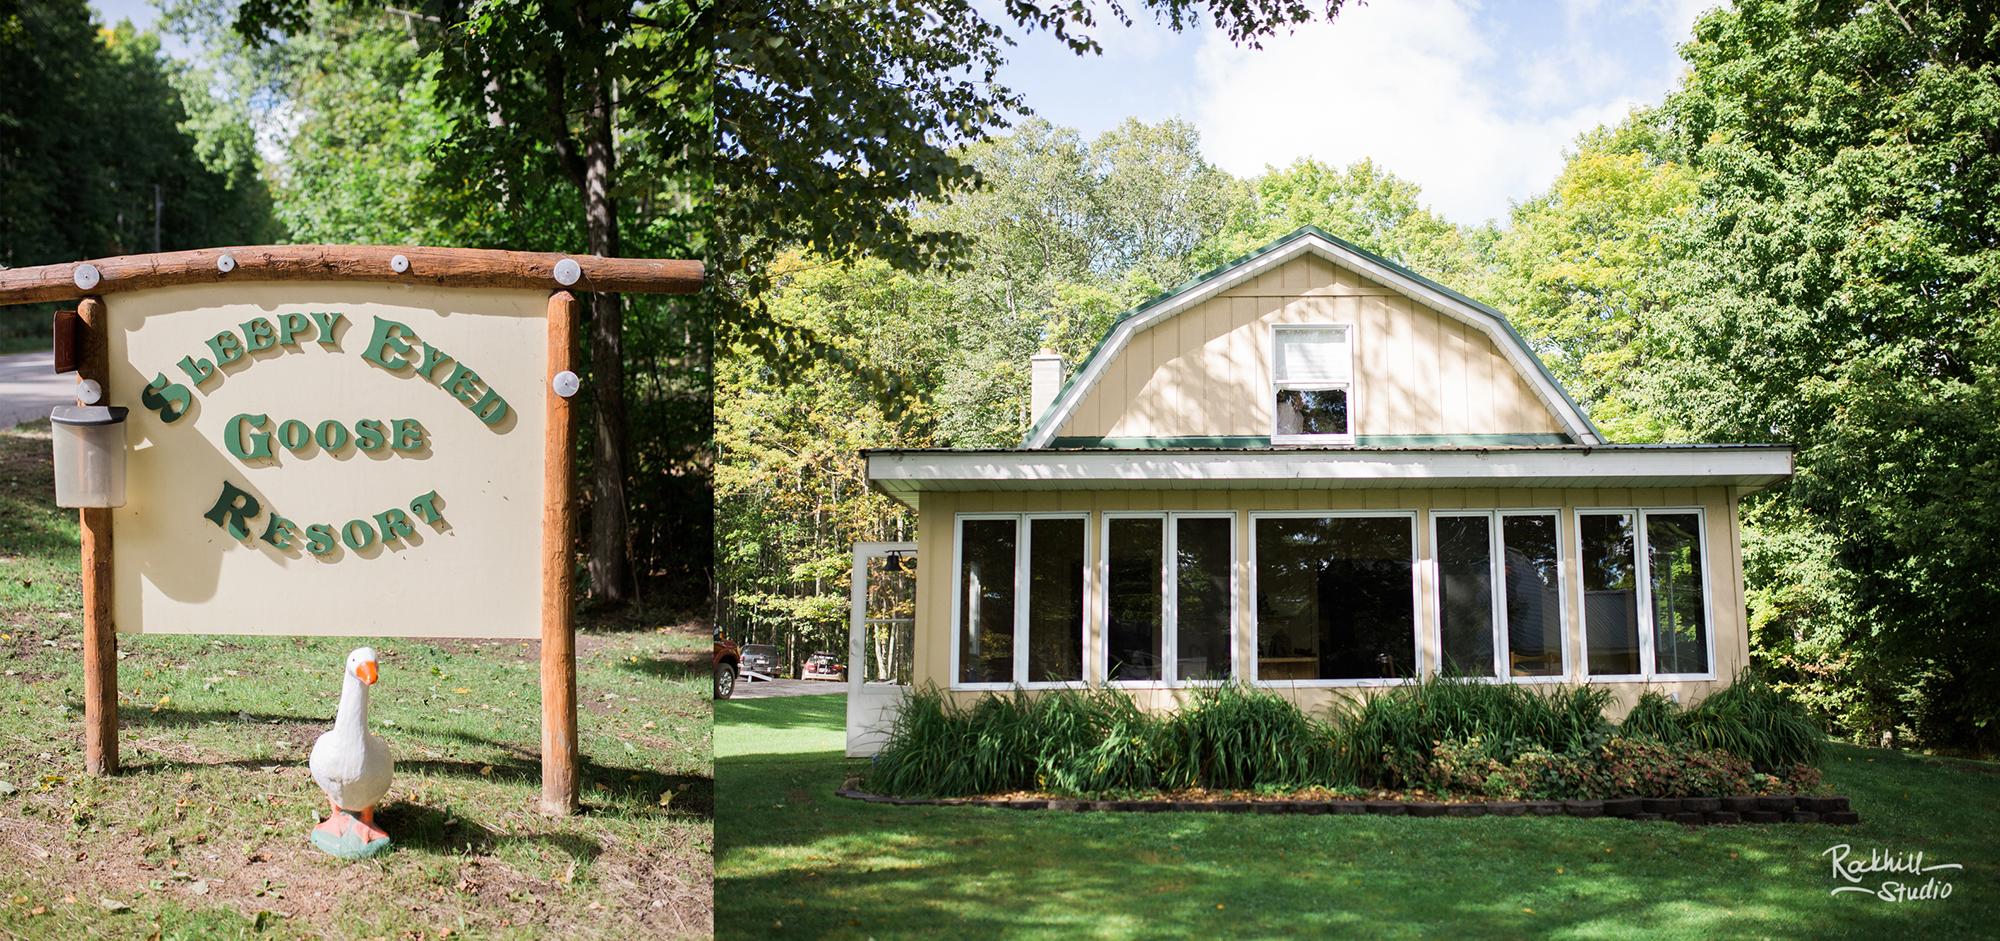 Rockhill-Studio-Curtis-Michigan-Wedding-upper-peninsula-michigan.jpg